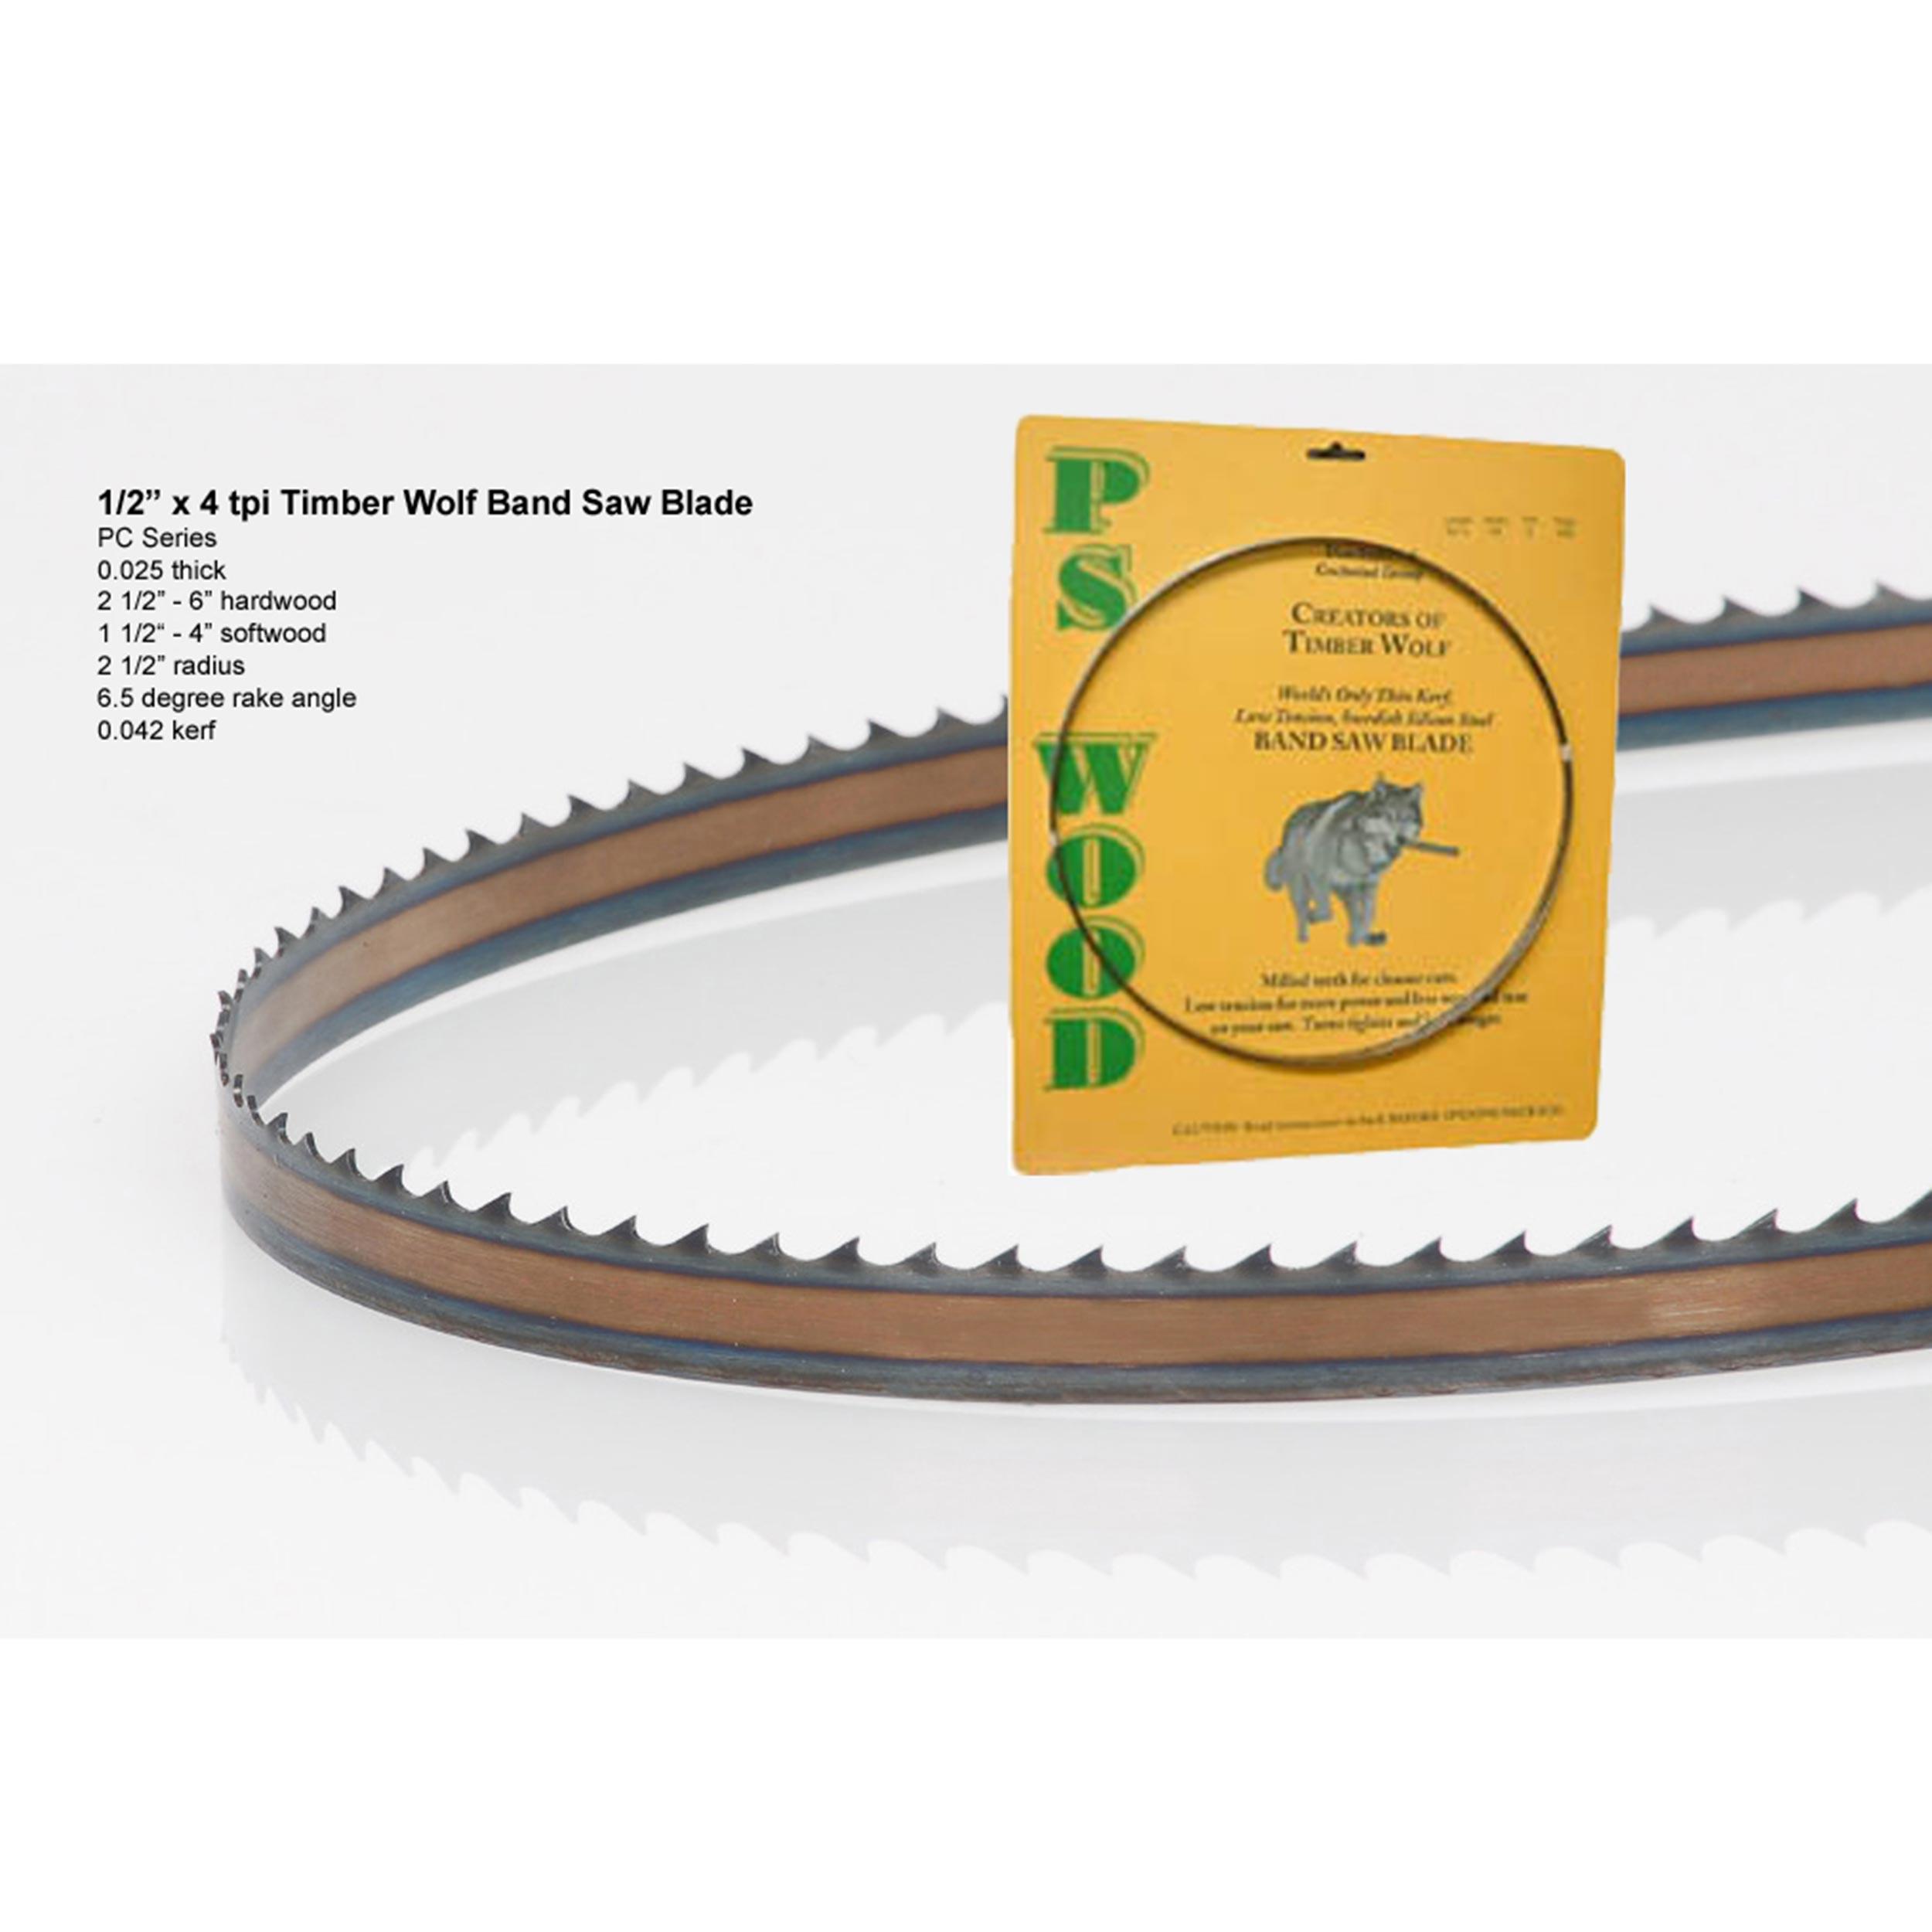 Bandsaw Blade 142